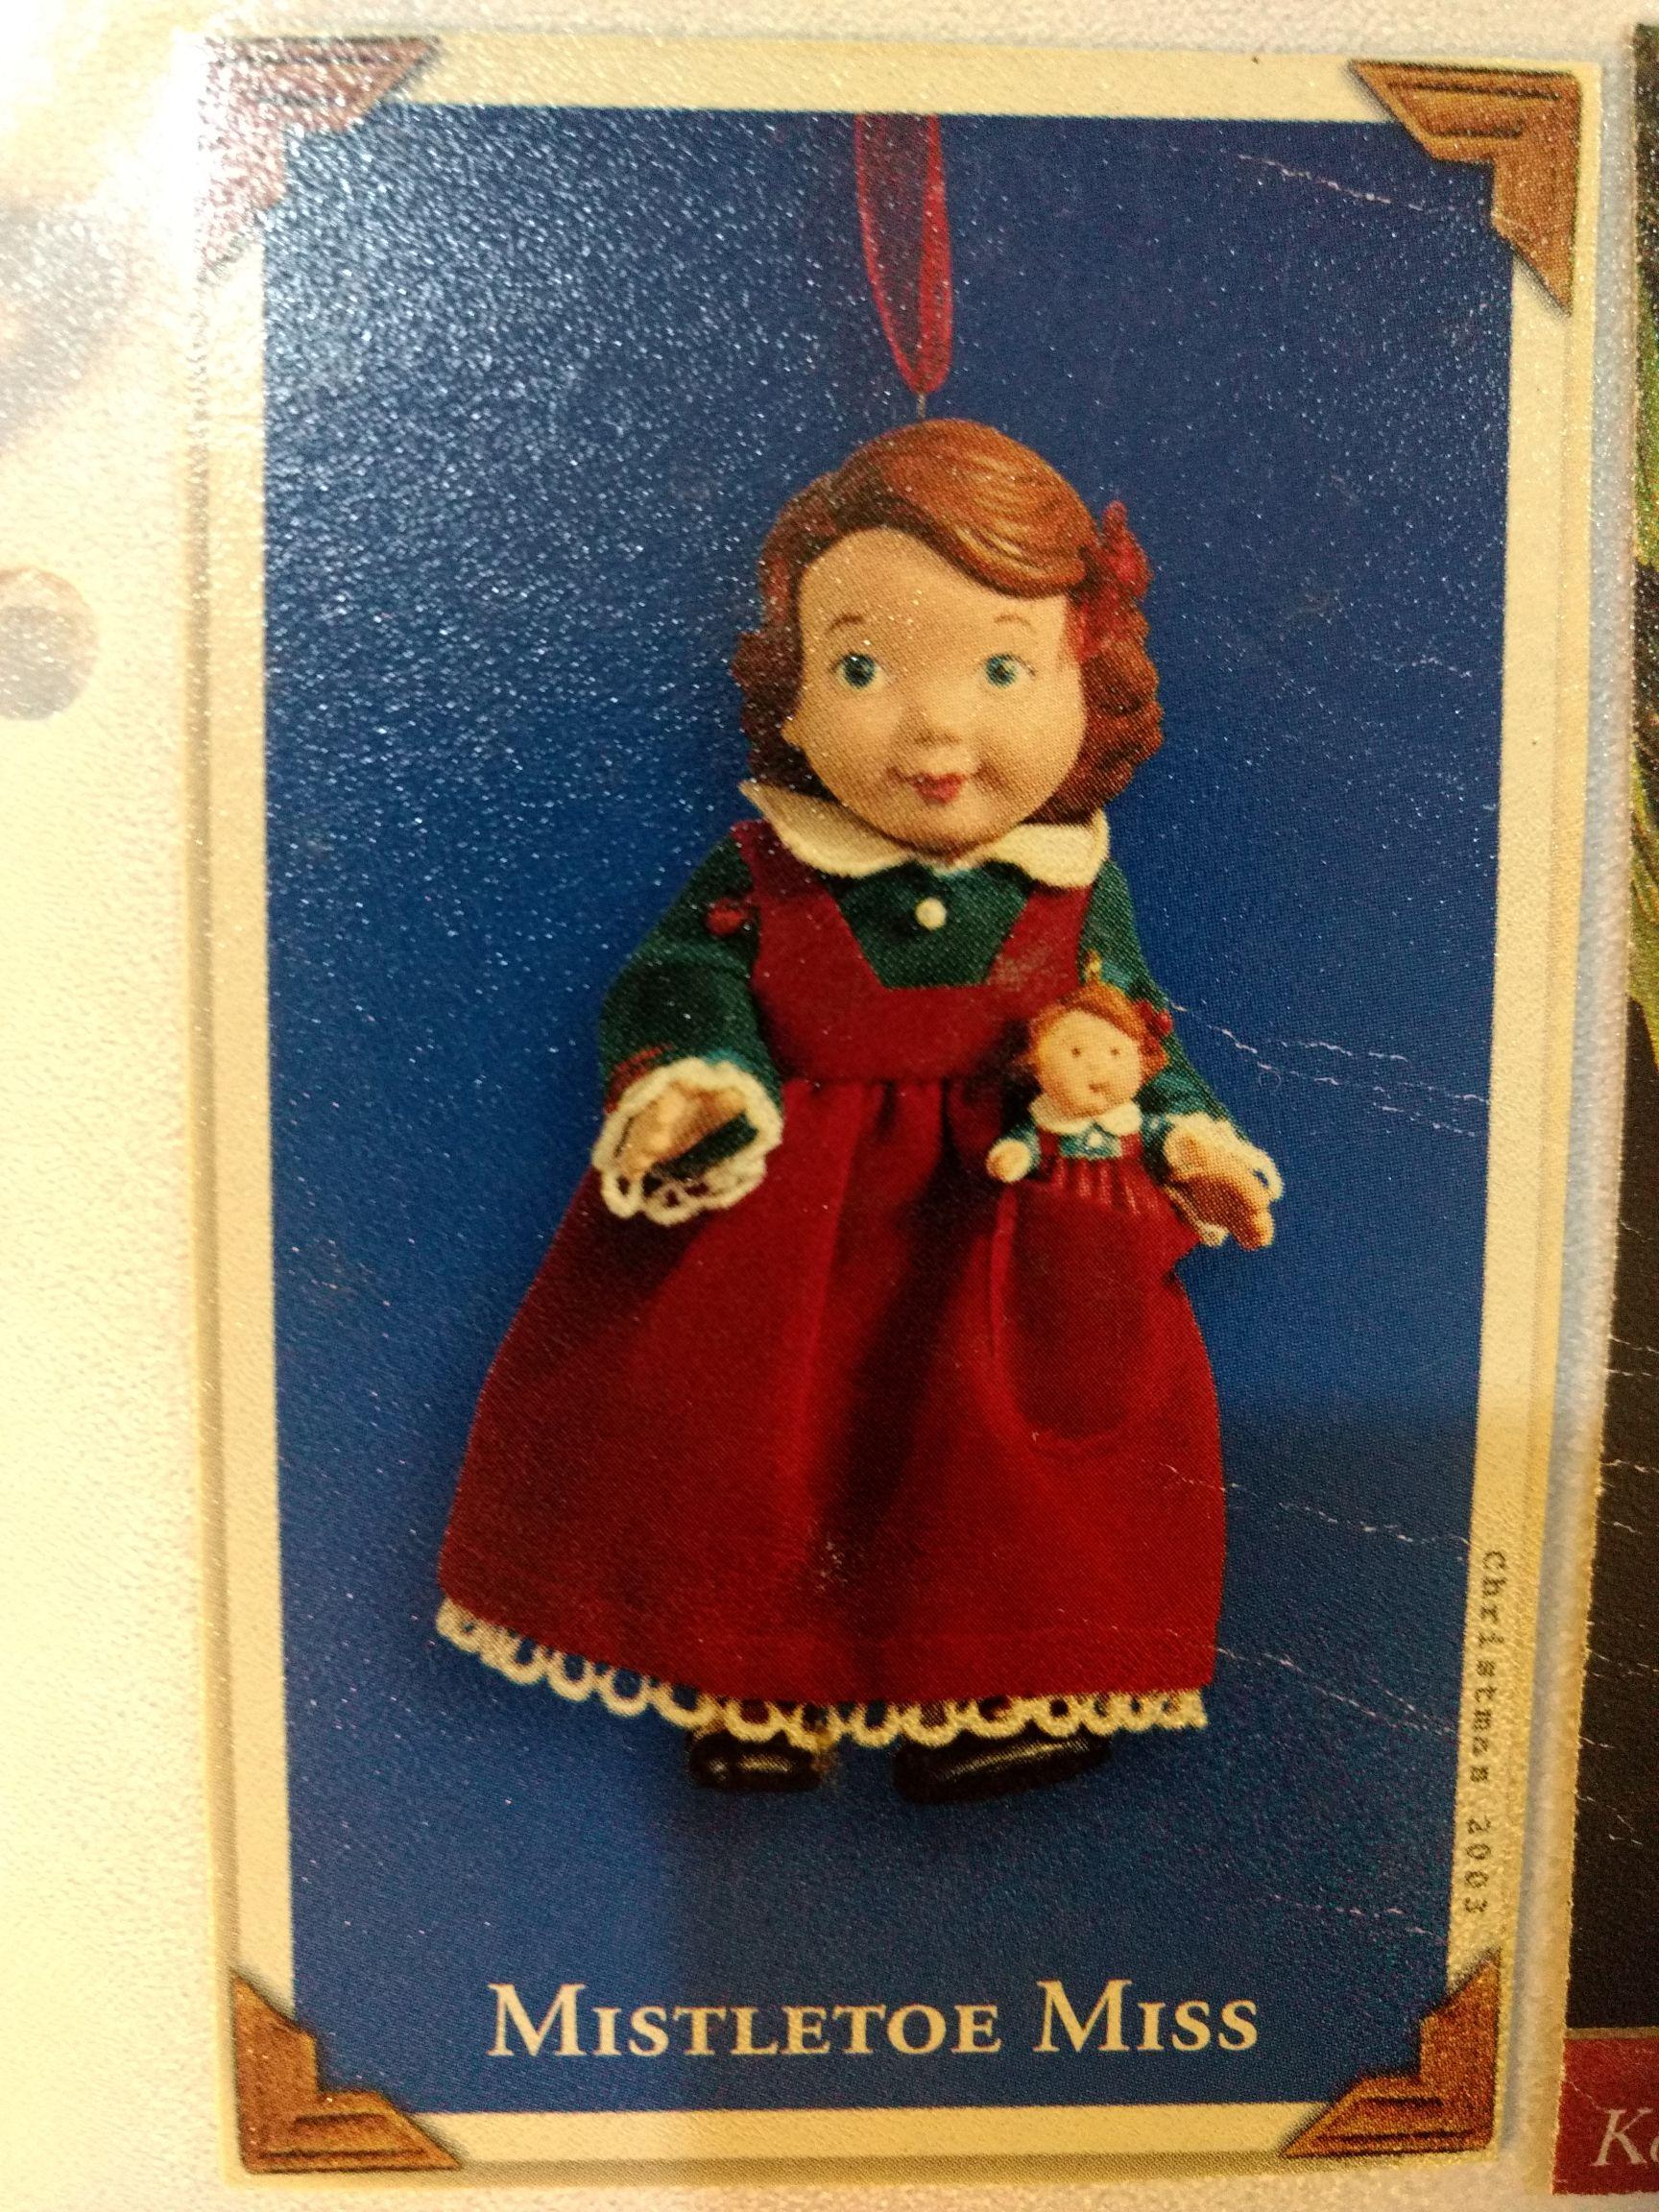 Madame Alexander - Mistletoe Miss Ornament - Hallmark front image (front cover)